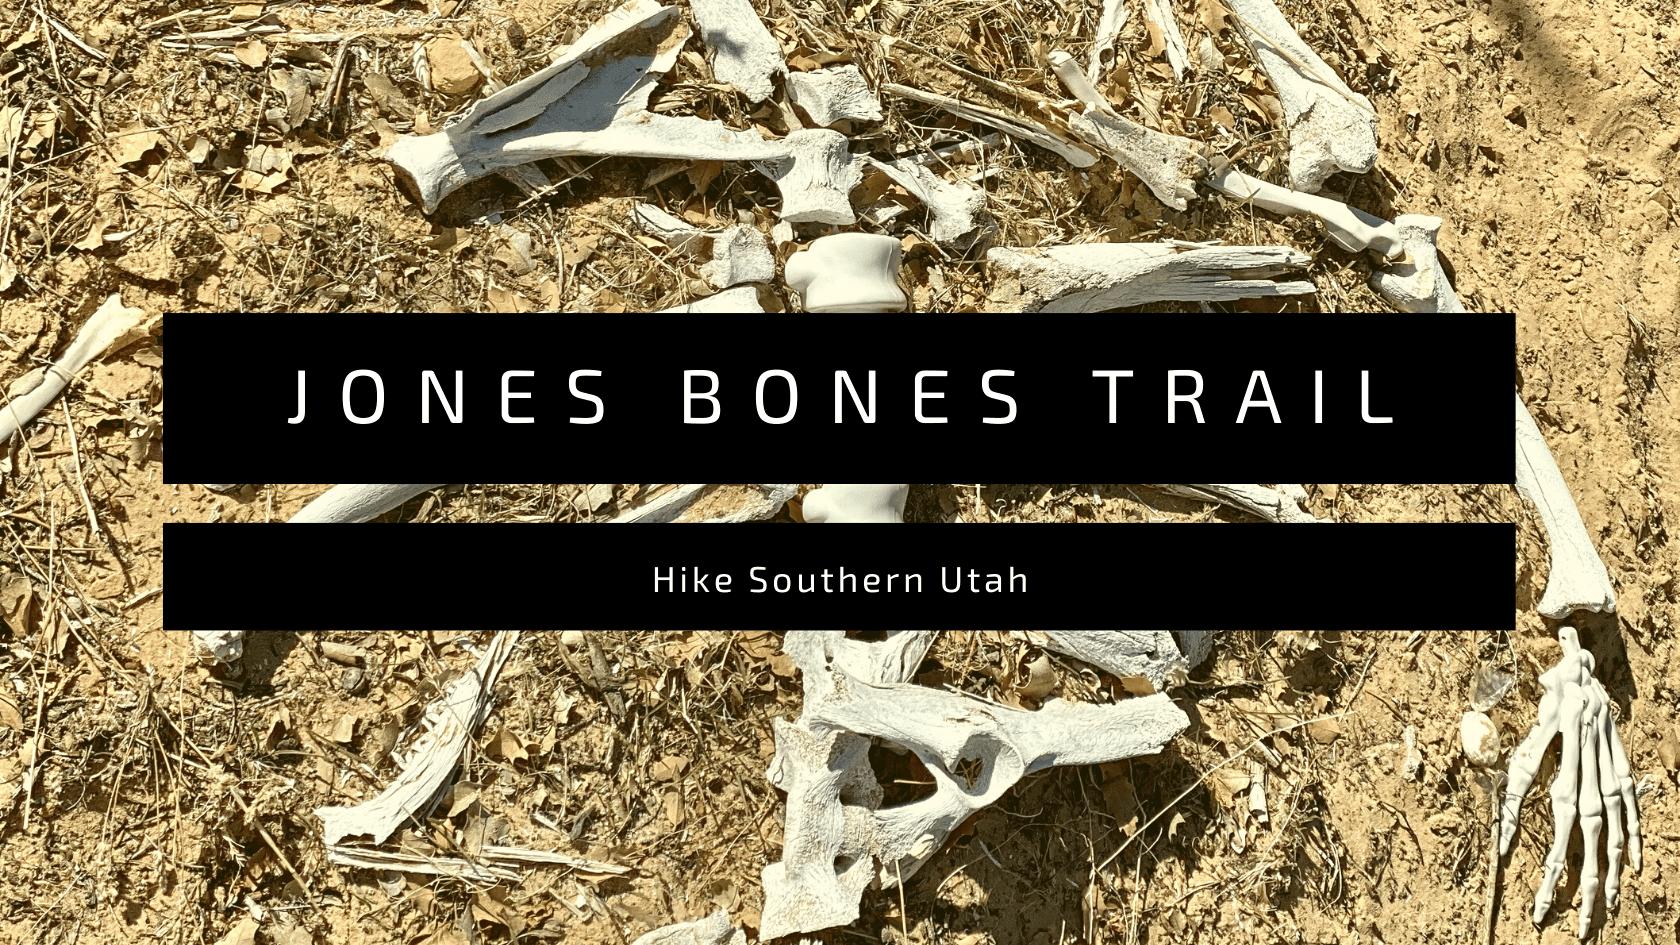 jones bones trail